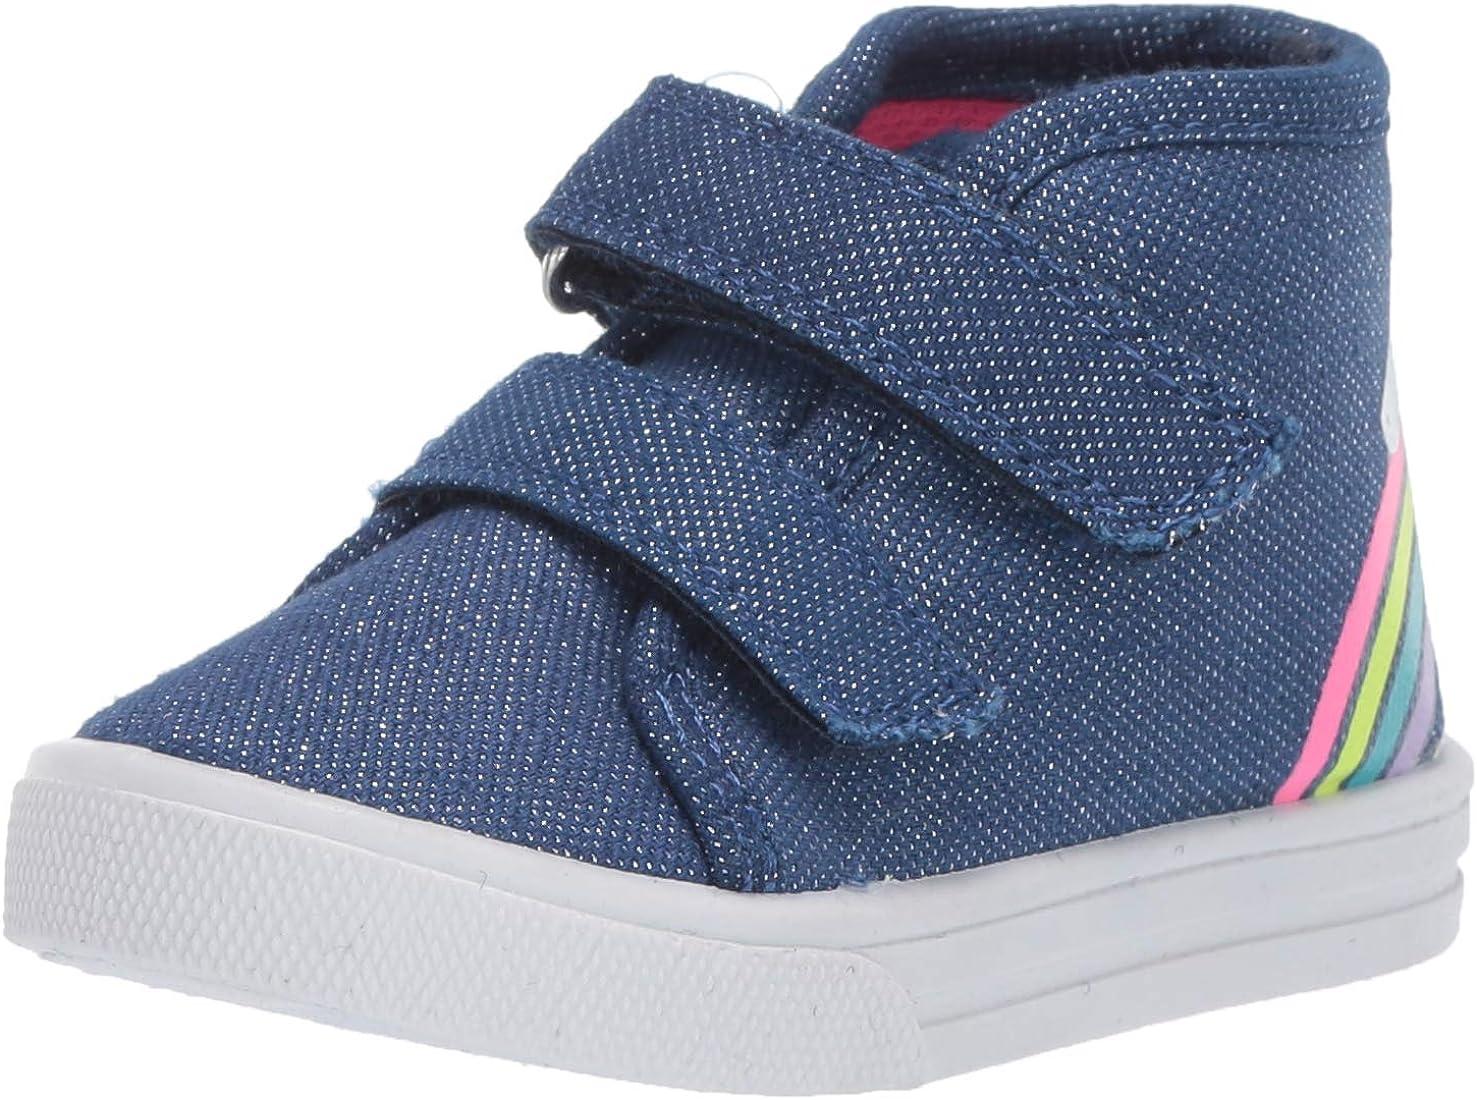 OshKosh B'Gosh Toddler and Little Girls Mane High Top Sneaker